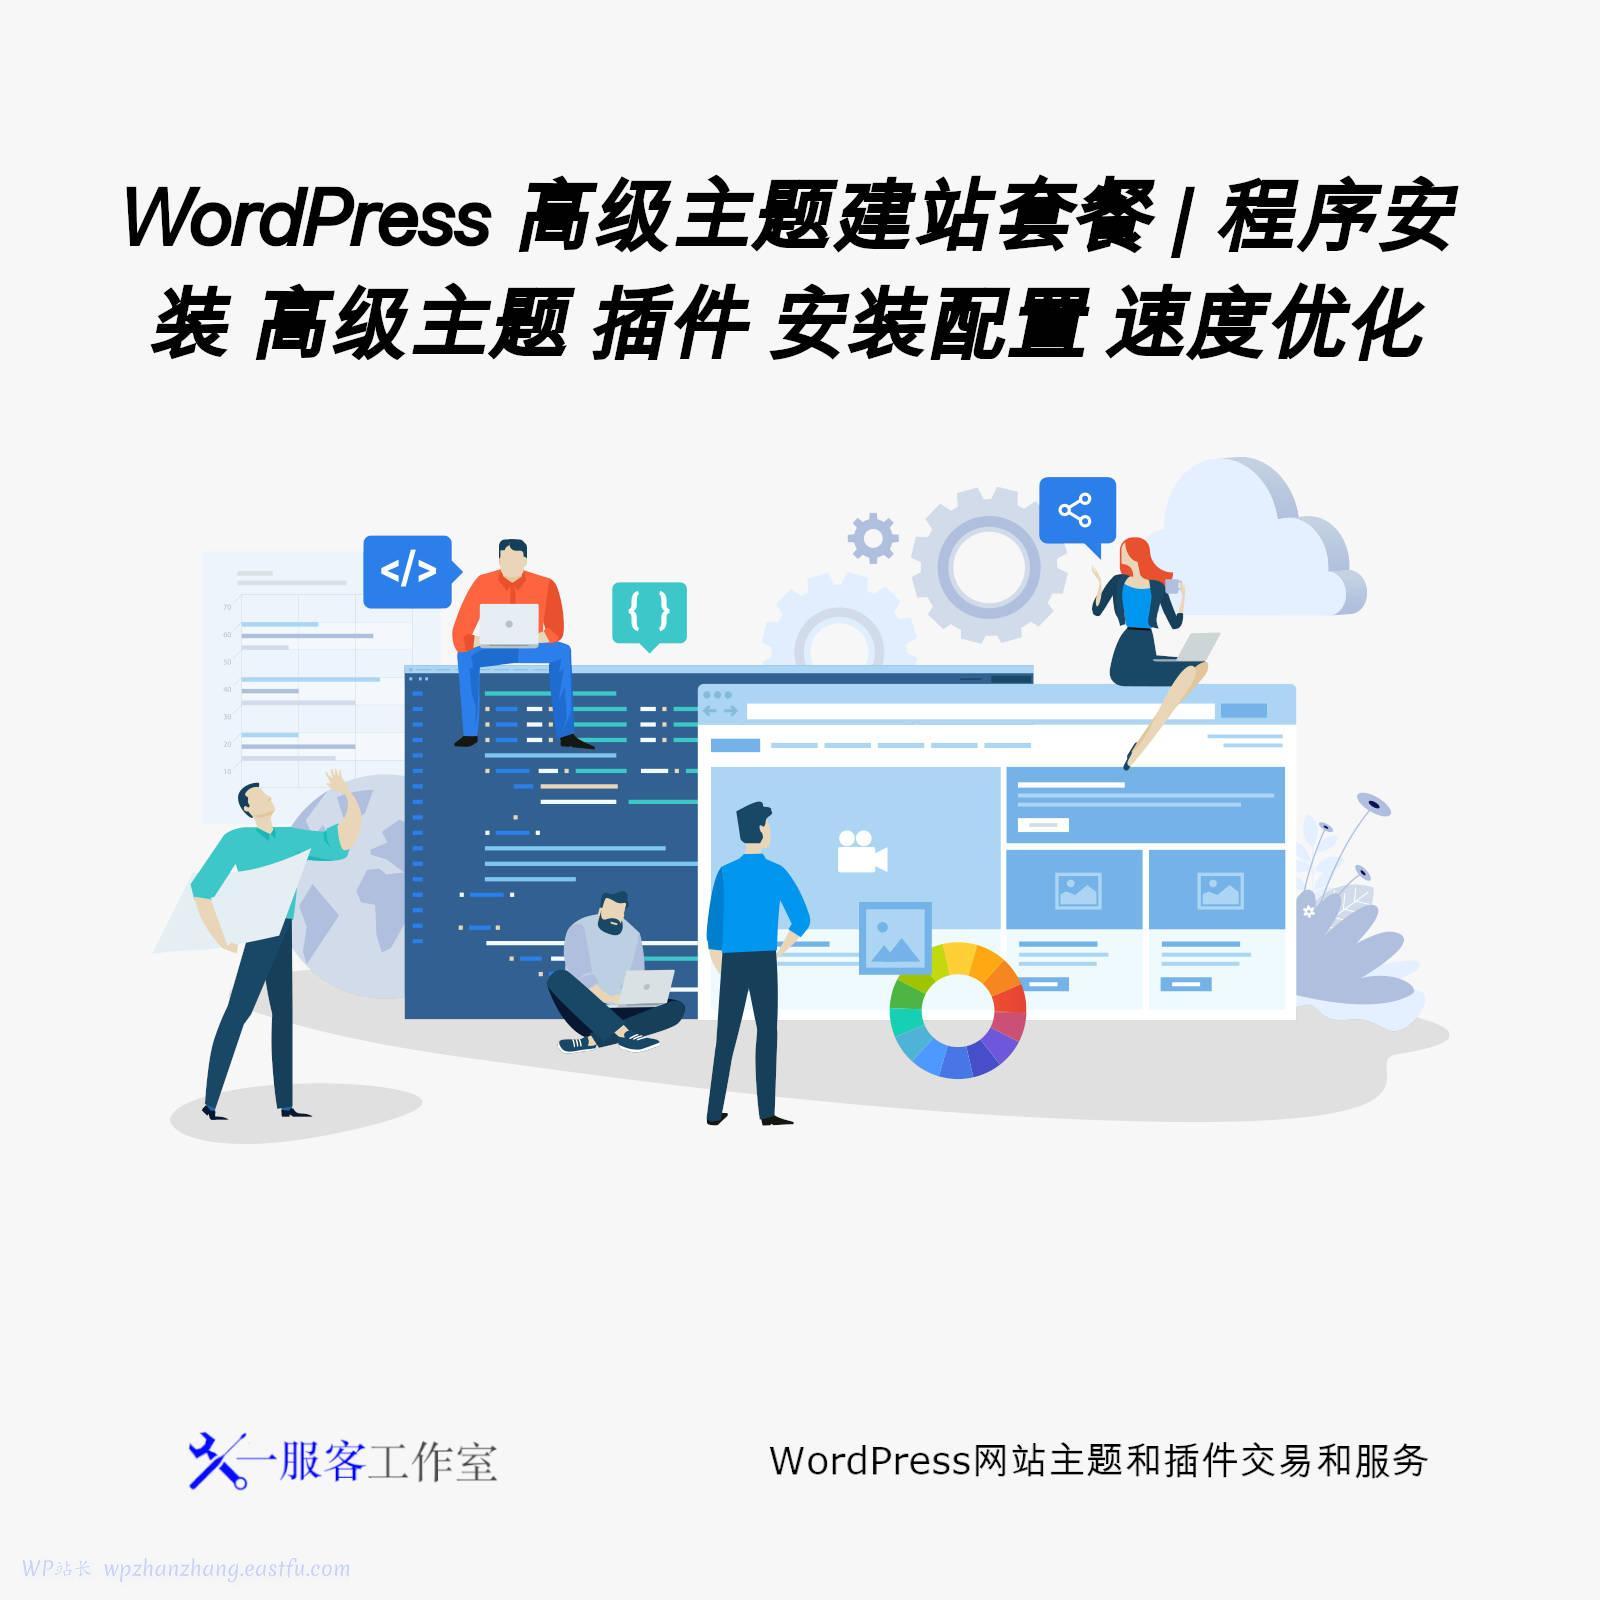 WordPress 高级主题快速建站服务